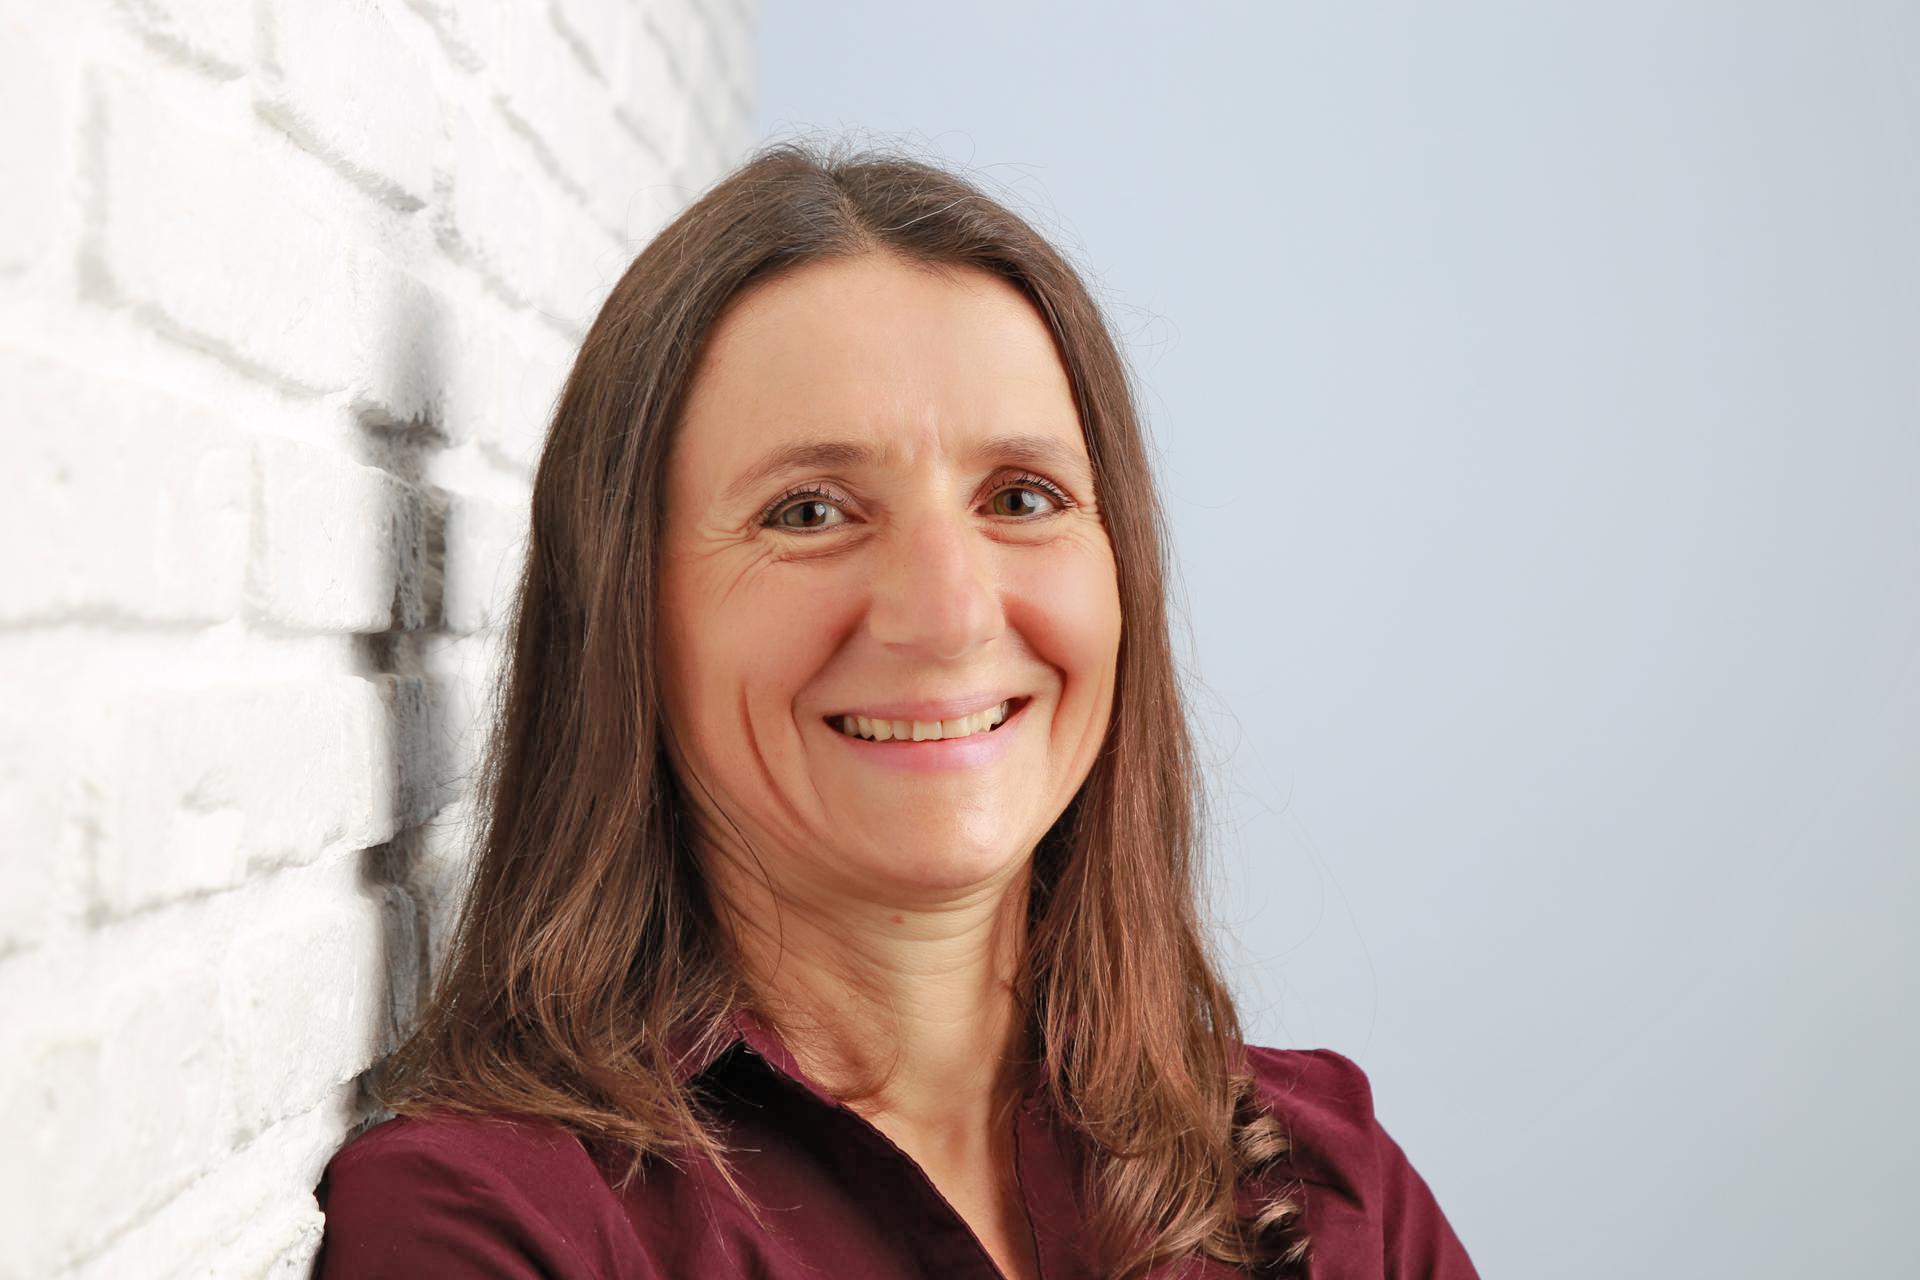 Mandy Ahlendorf